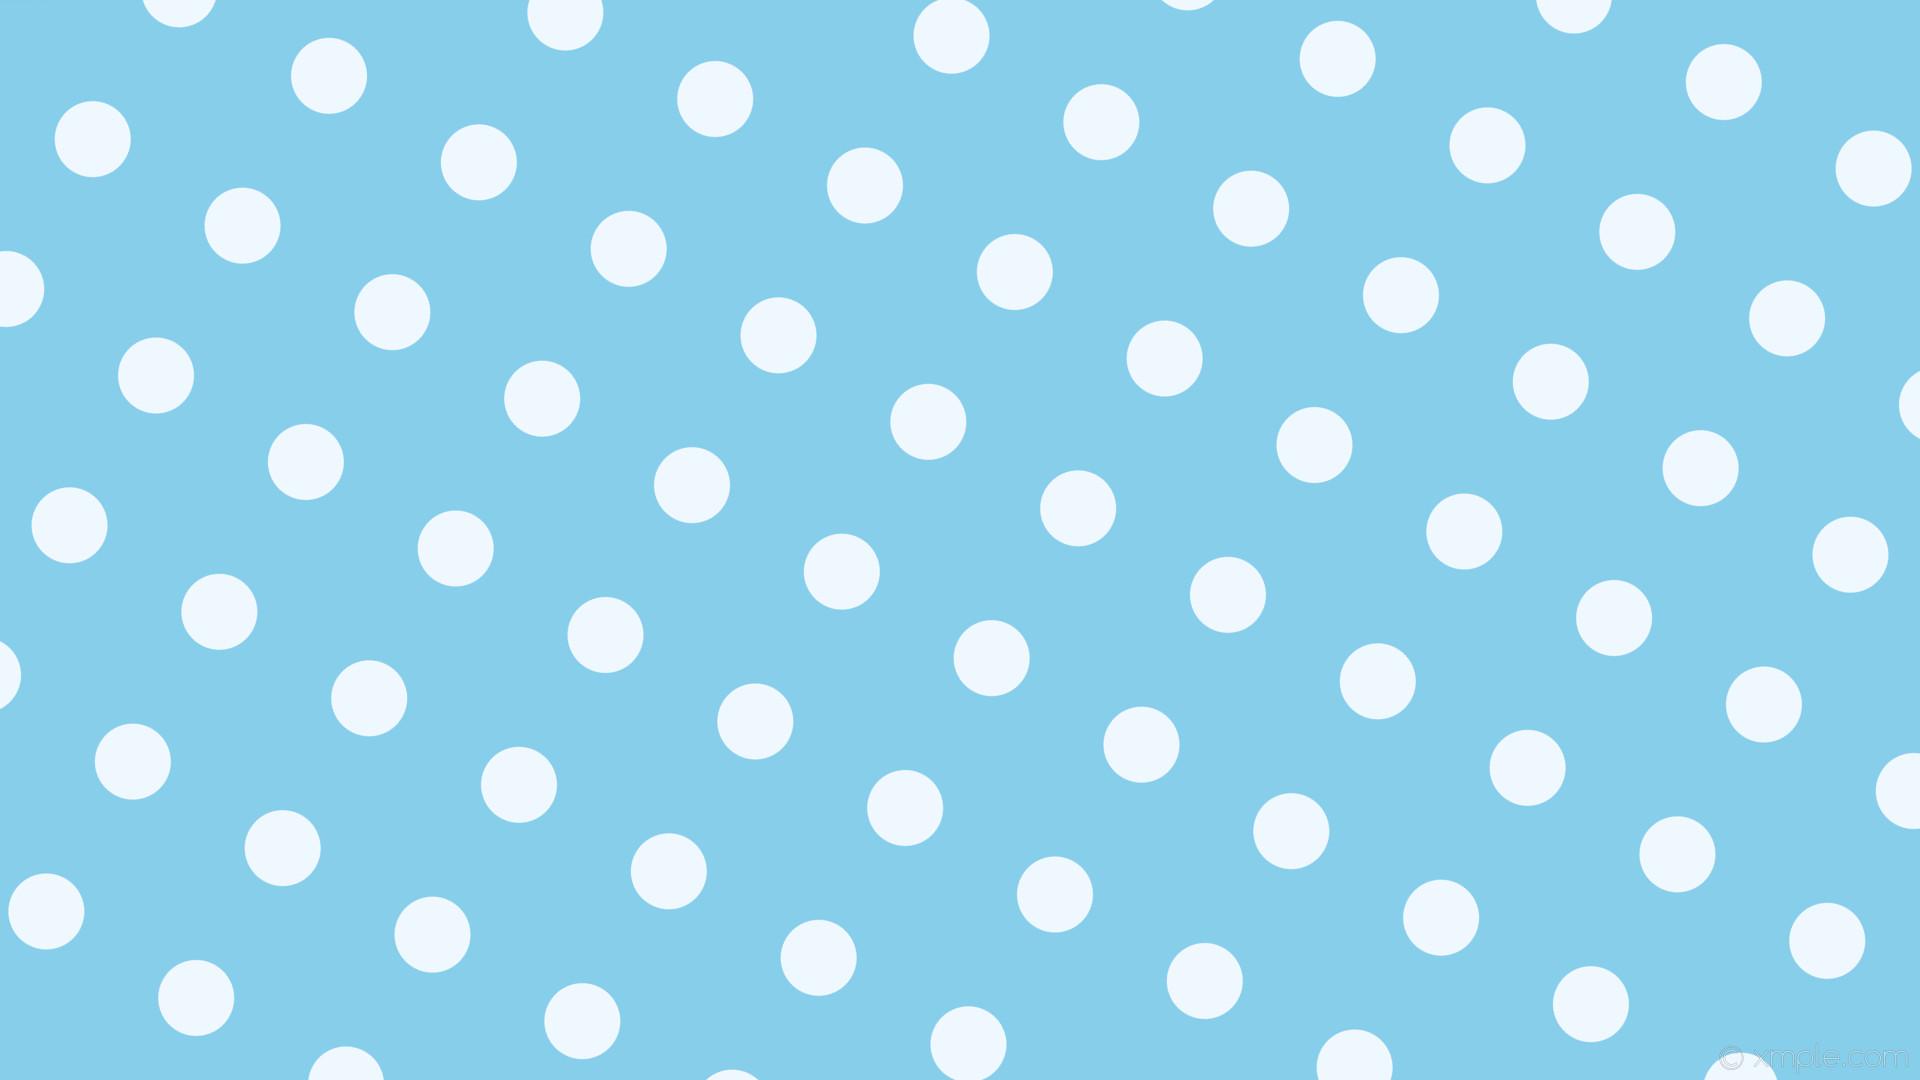 1920x1080 Wallpaper Streaks Blue Black Lines White Stripes Aqua Cyan 000000 Ffffff 00ffff Diagonal